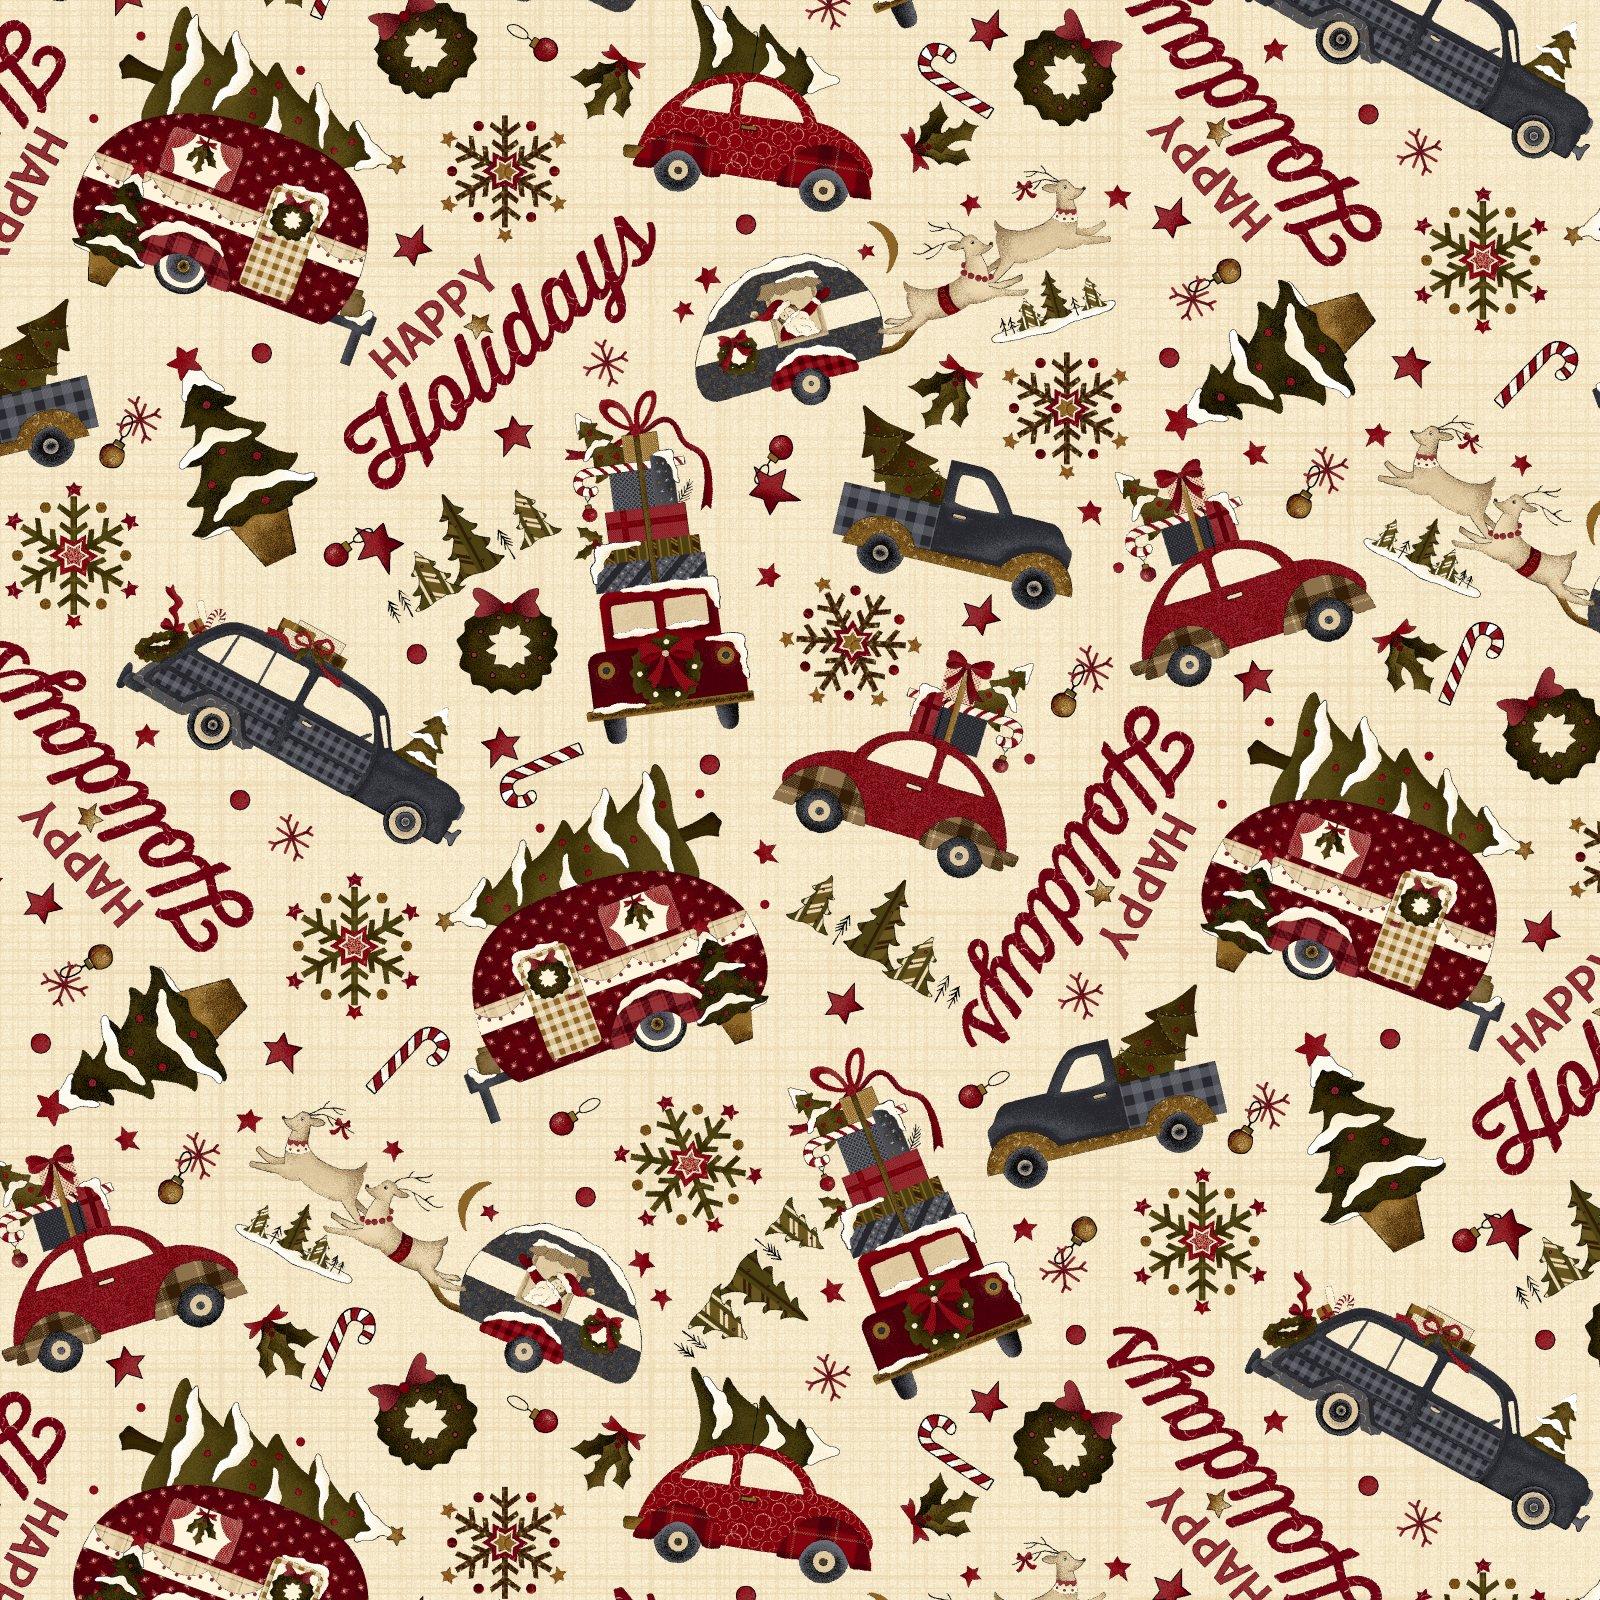 Buttermilk Winter - 2283-33 * 1/2 yard